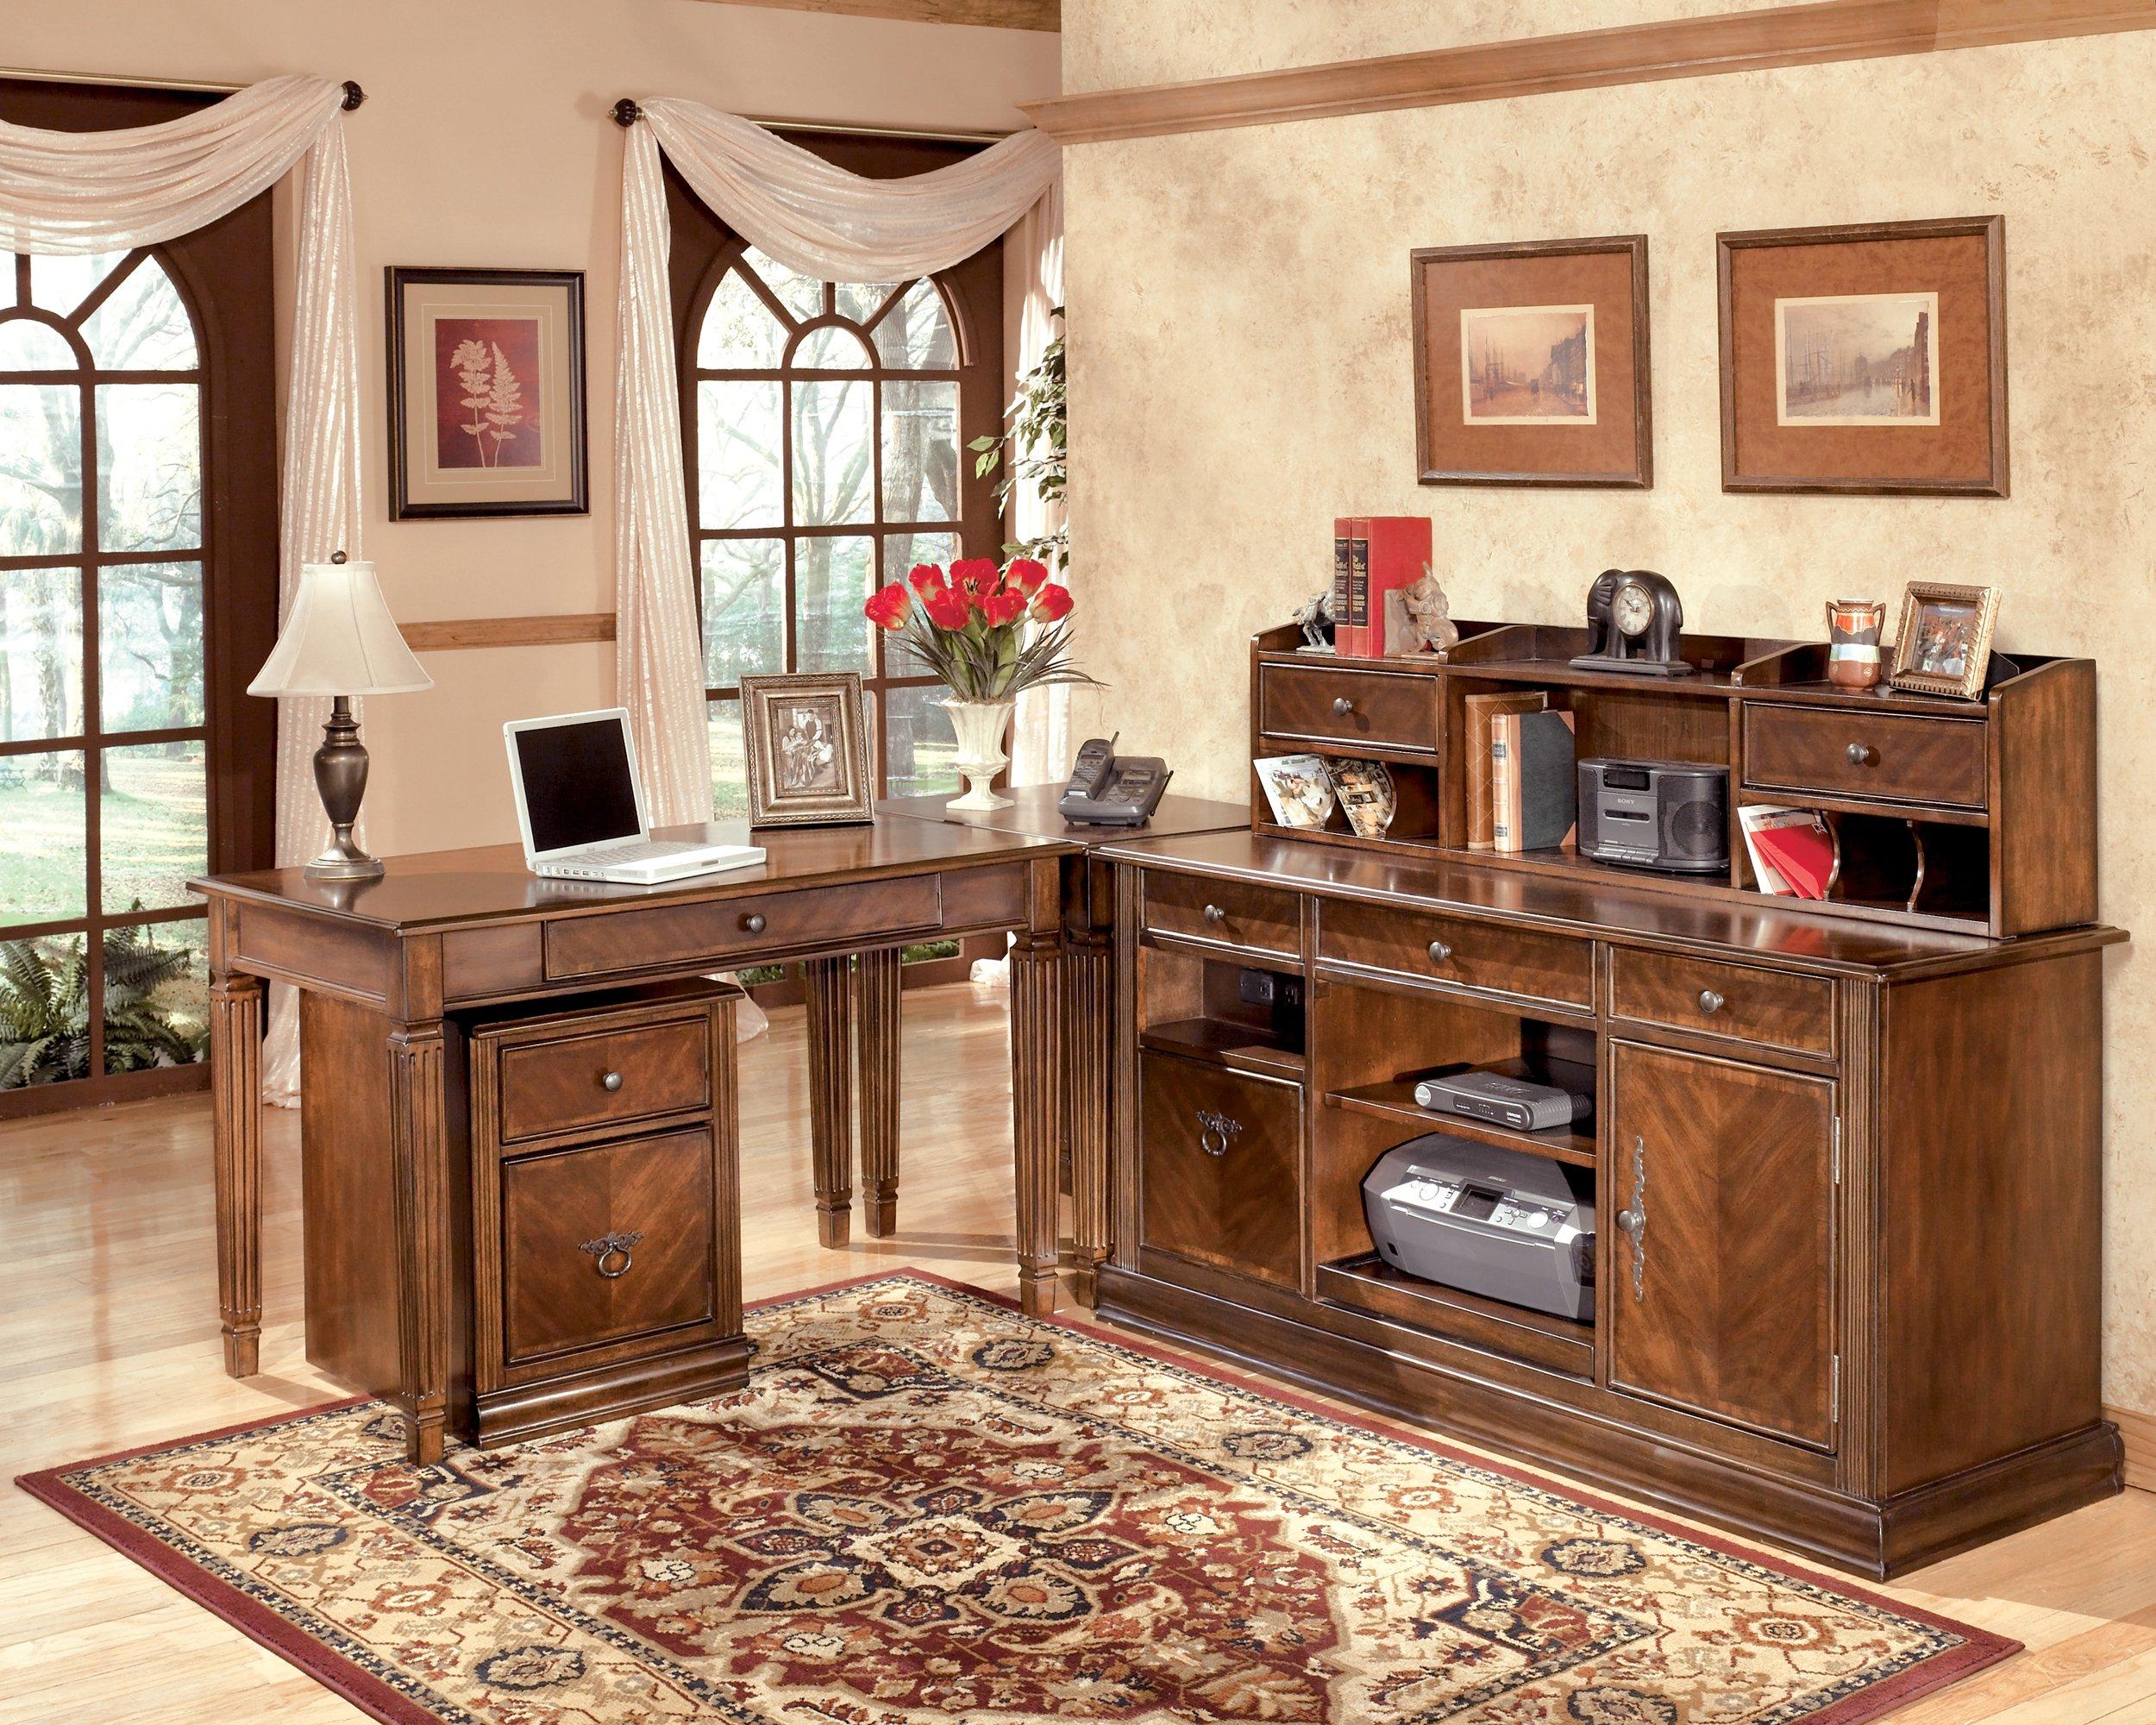 Ashley Furniture Signature Design - Hamlyn File Cabinet - 1 Drawer/1 File Drawer - Traditional - Medium Brown Finish by Signature Design by Ashley